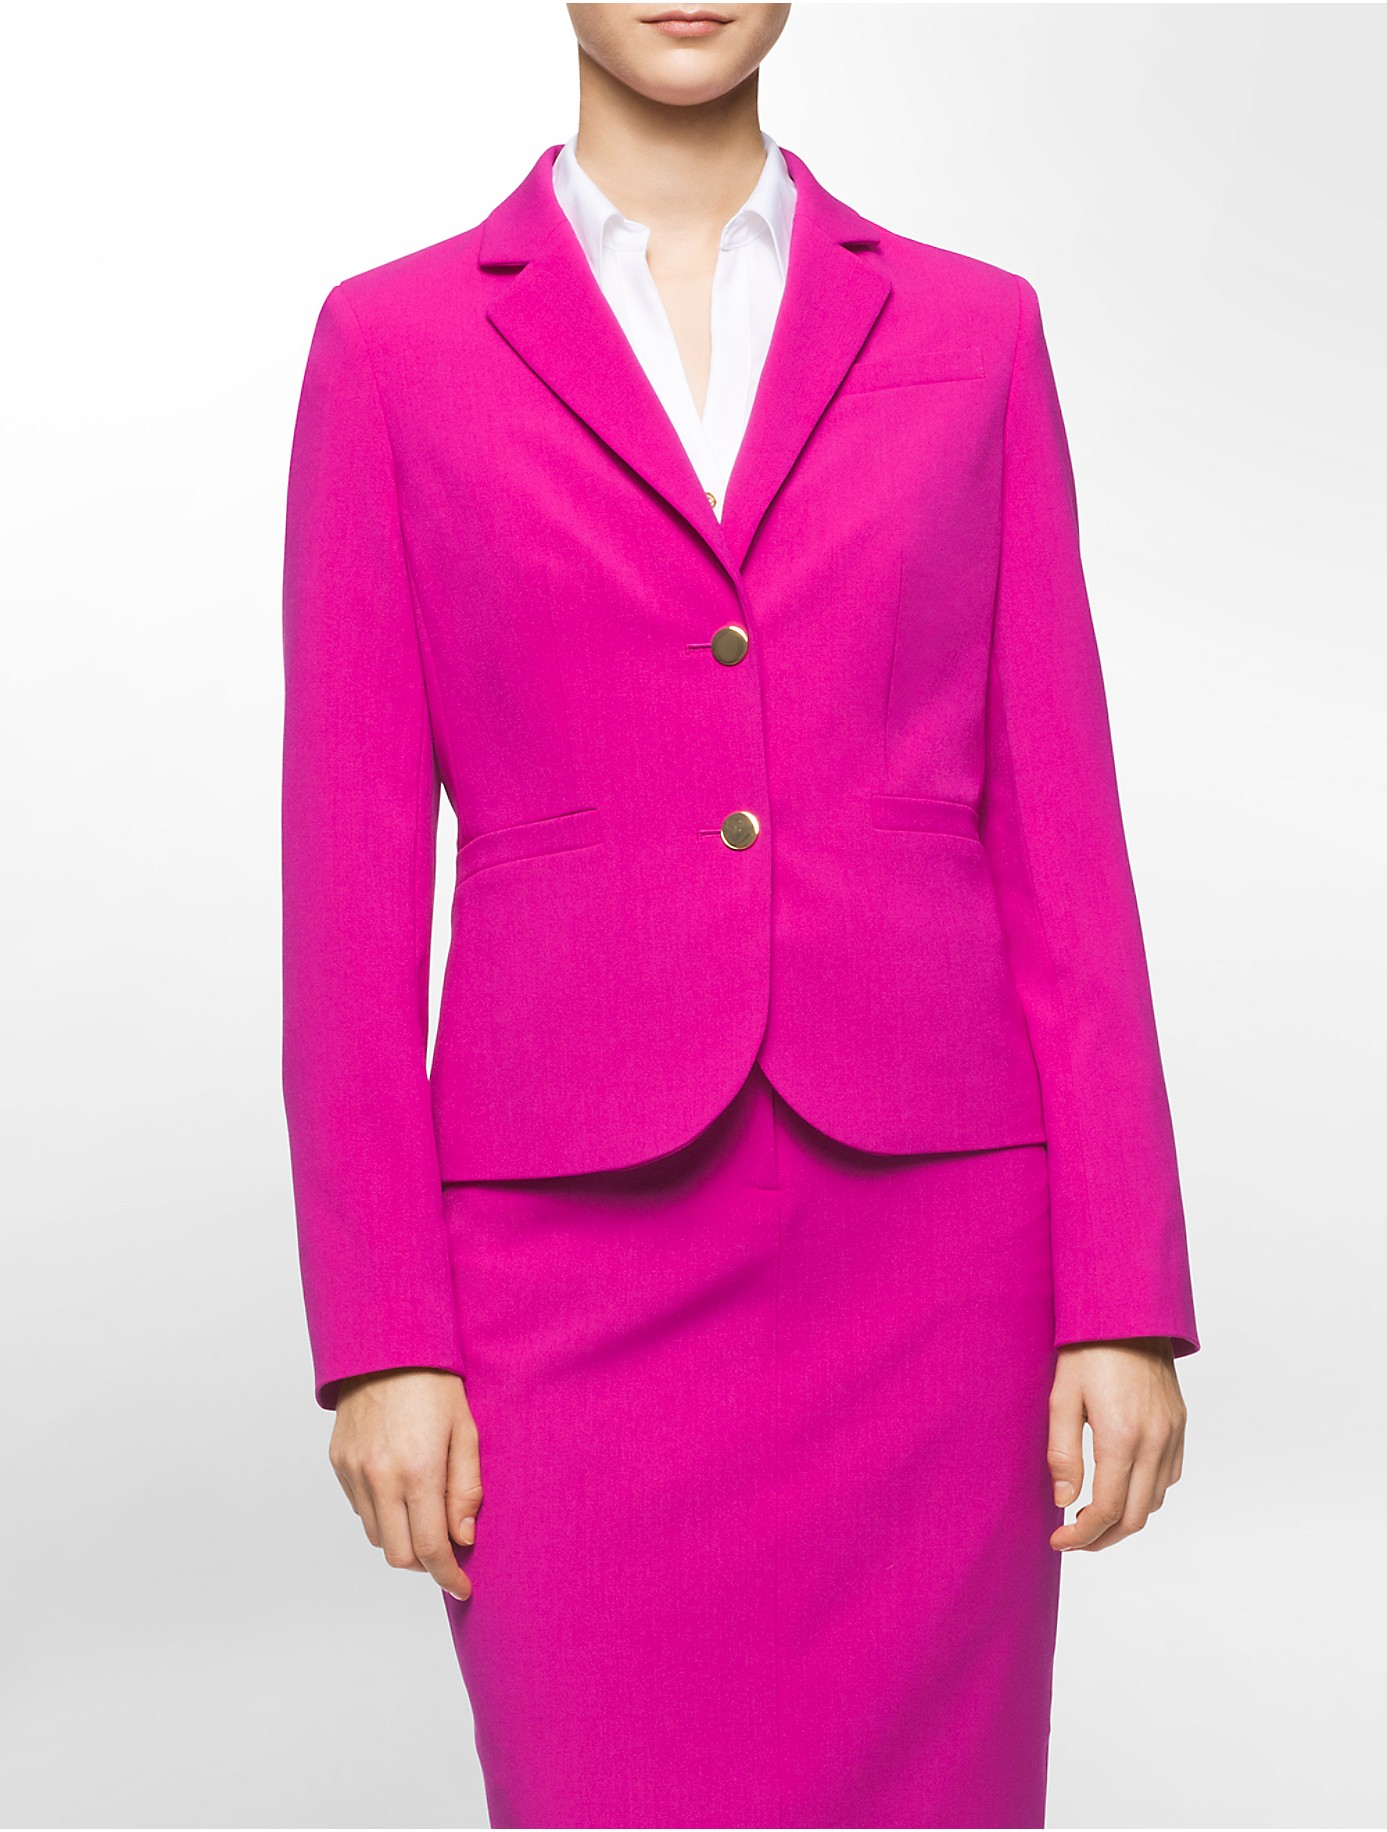 Lyst Calvin Klein White Label One Button Suit Jacket In Pink